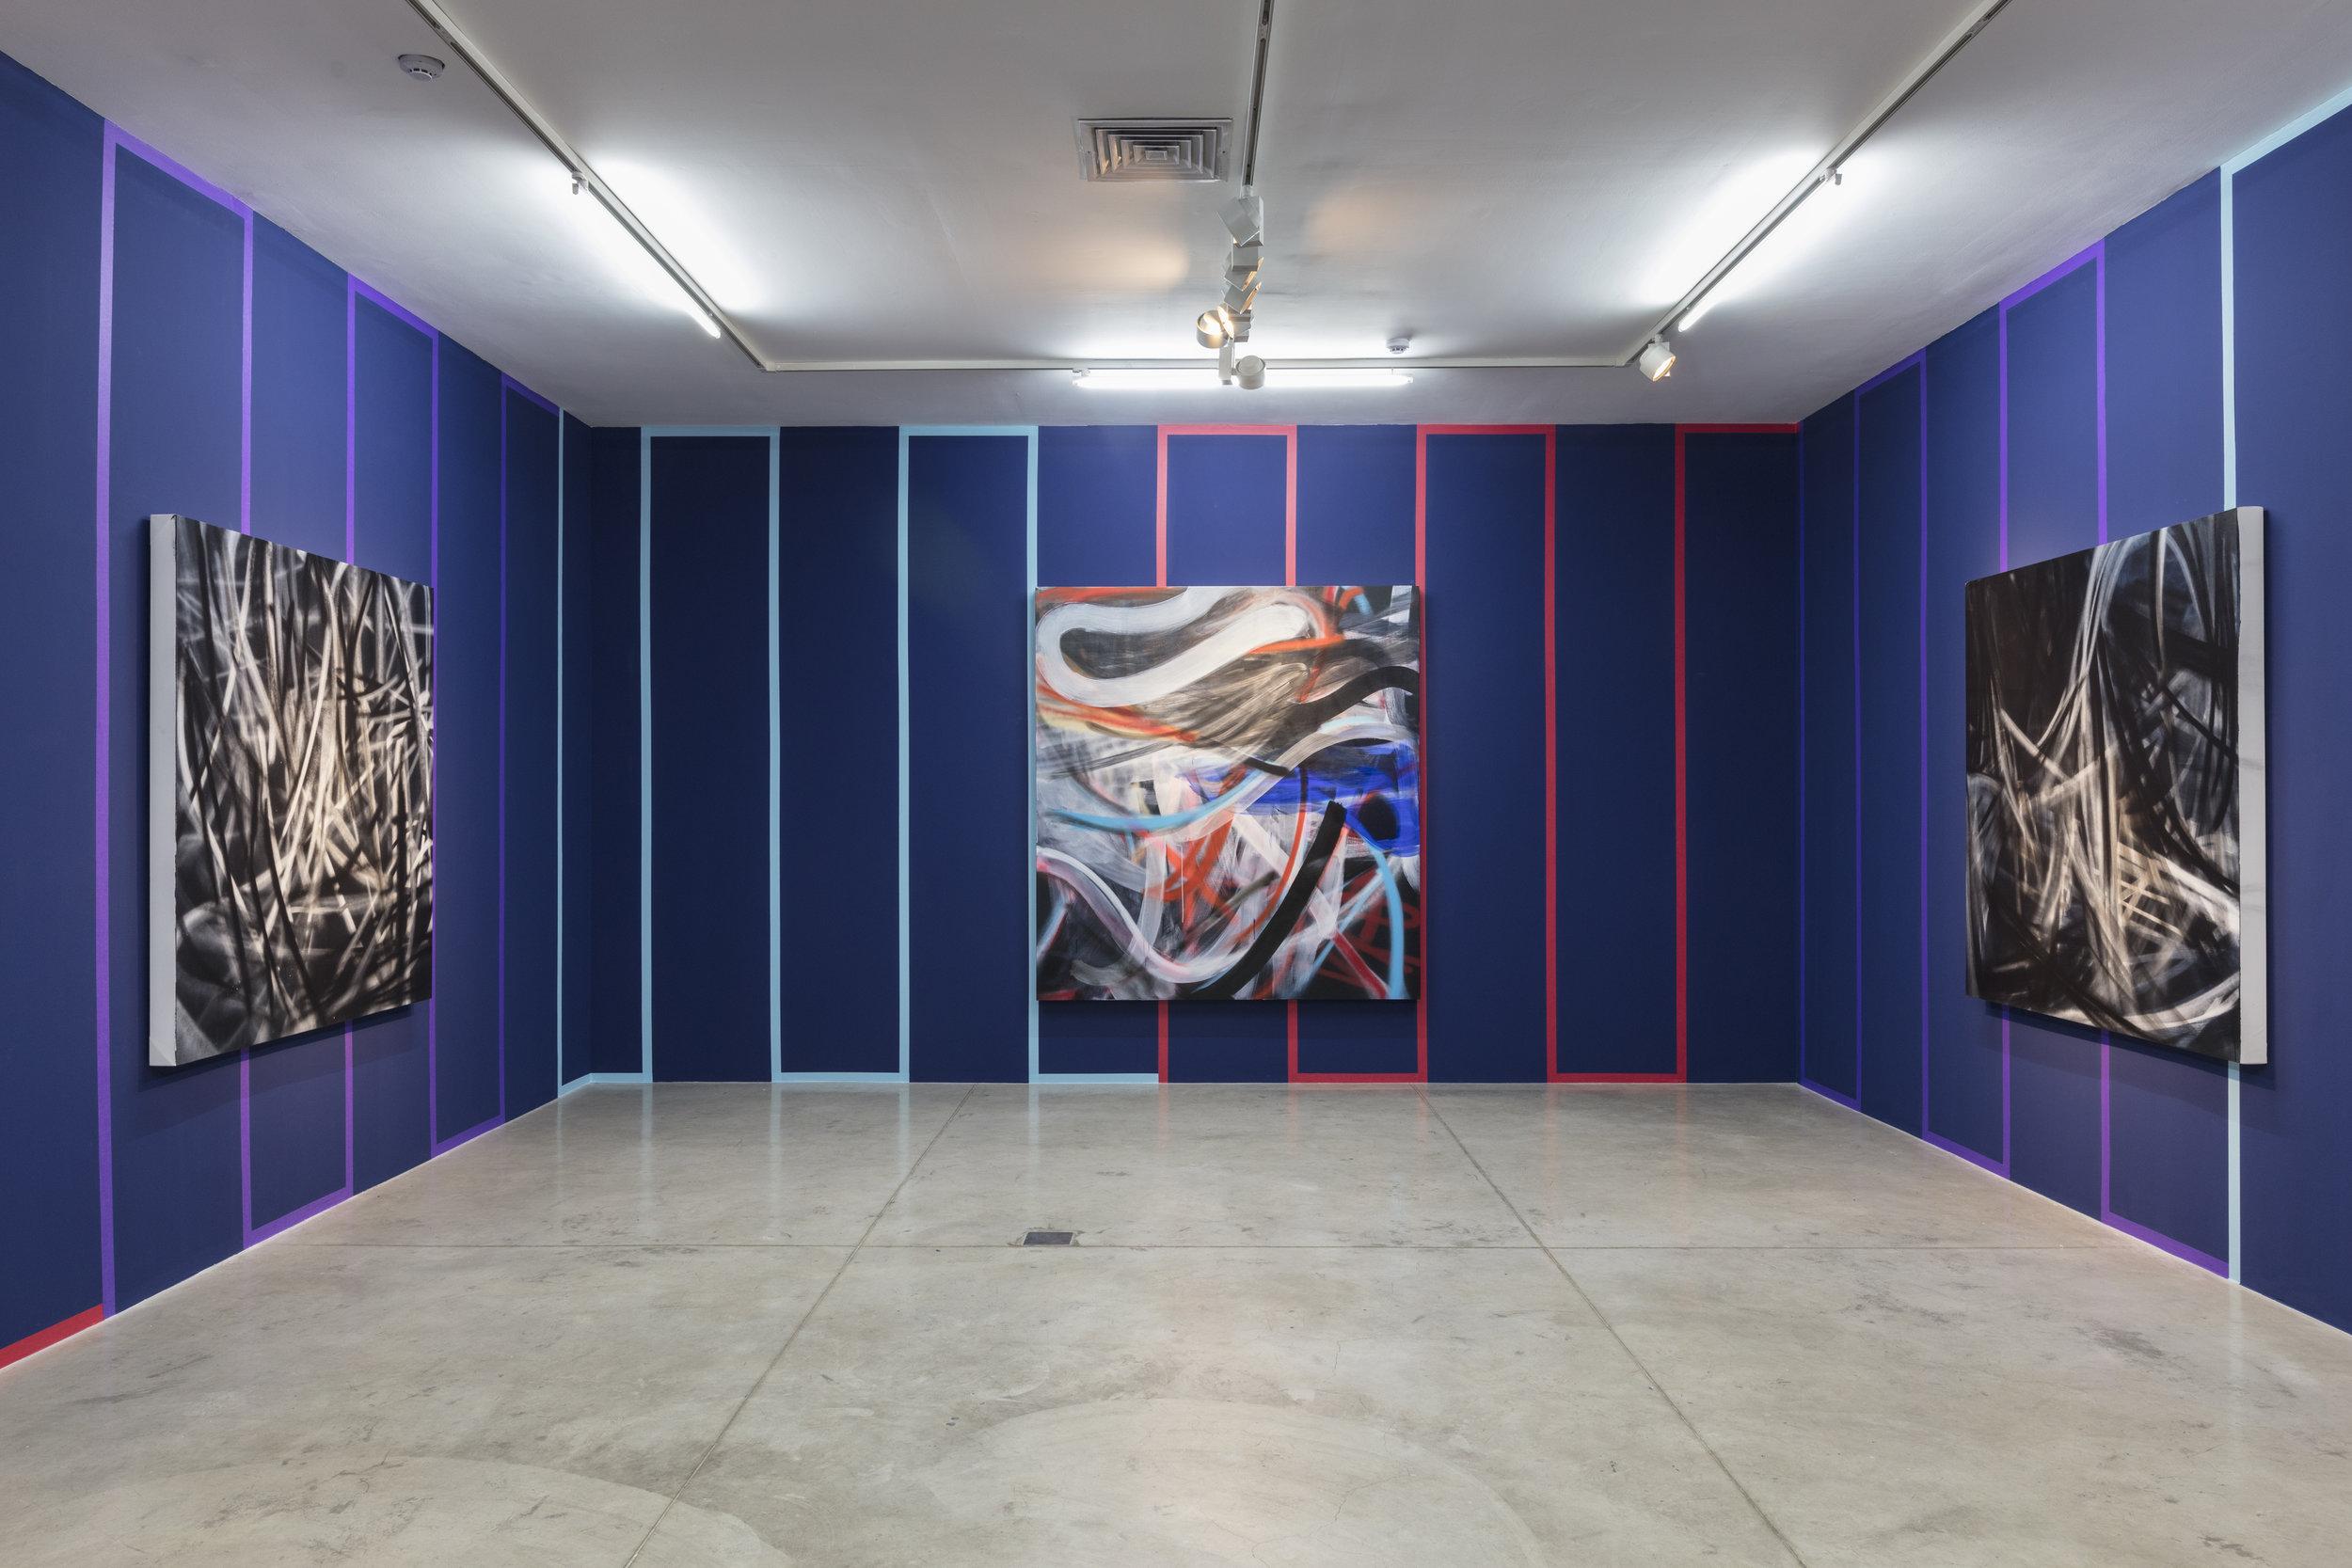 Caja de sueños (Box of dreams), Museu MATE, Lima, Peru, 25 November 2018 - 27 January 2019